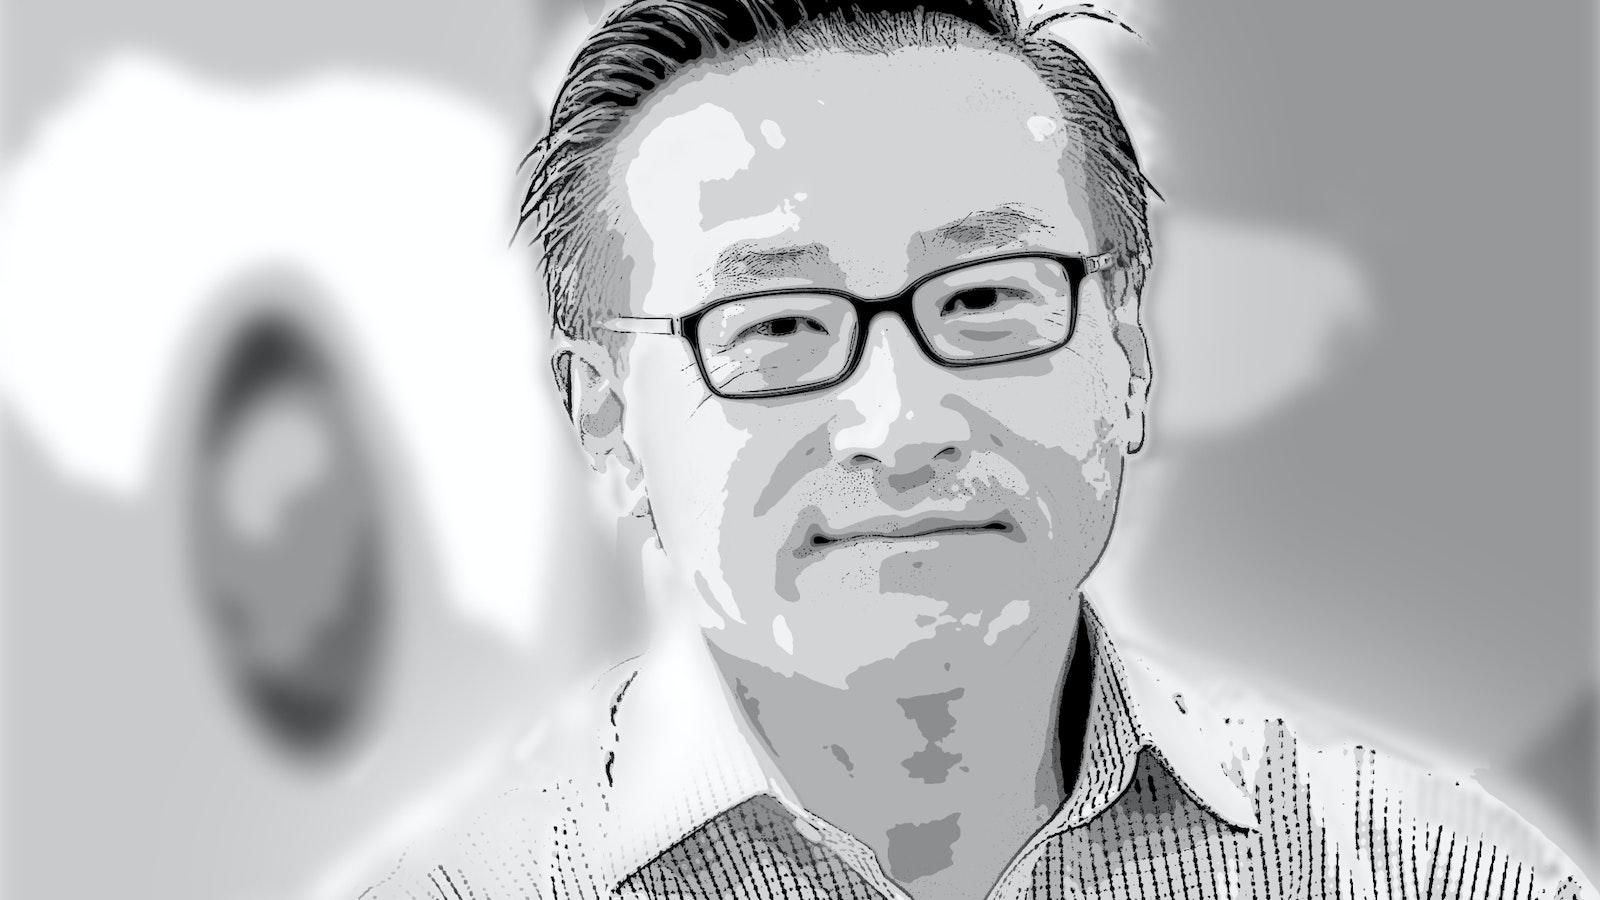 Alibaba Executive Vice Chairman Joe Tsai. Art by Matt Vascellaro.